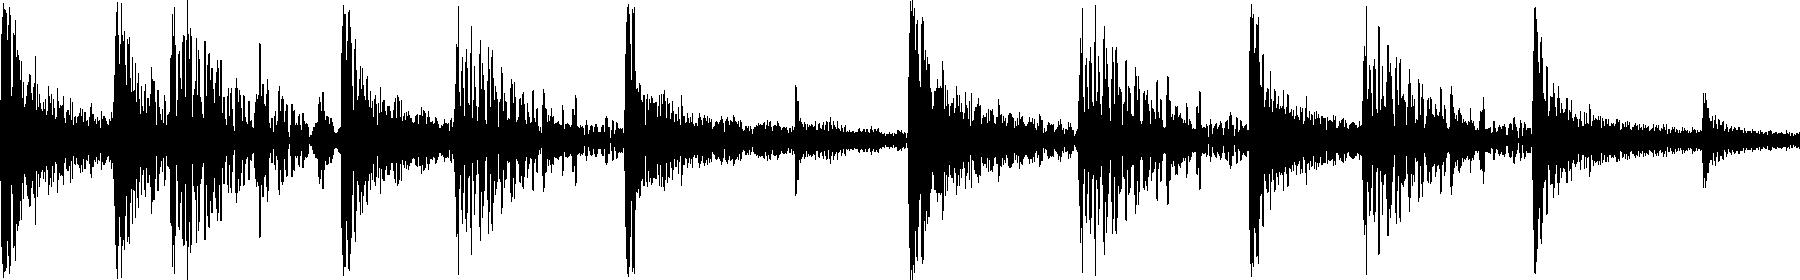 bluezone bc0210 percussion loop 002 110